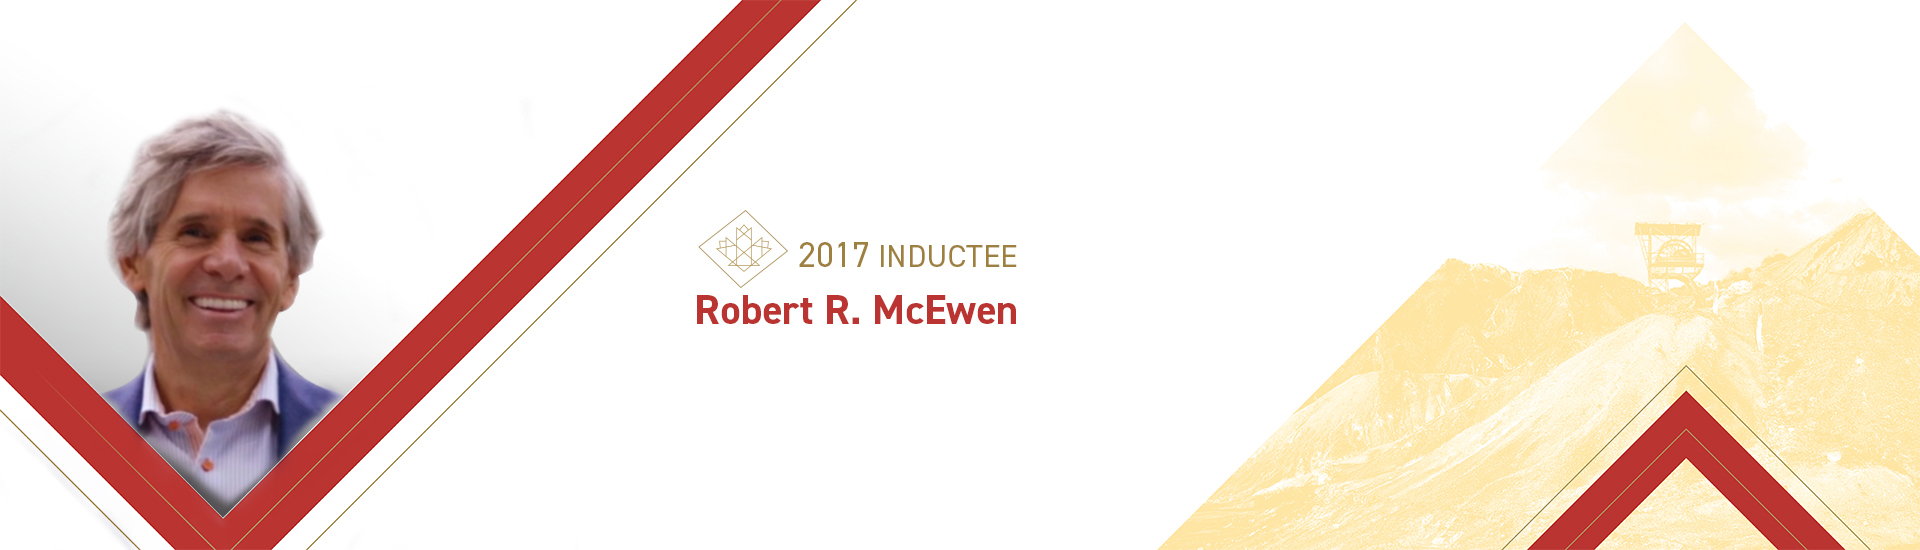 Robert R. McEwen (b. 1950)